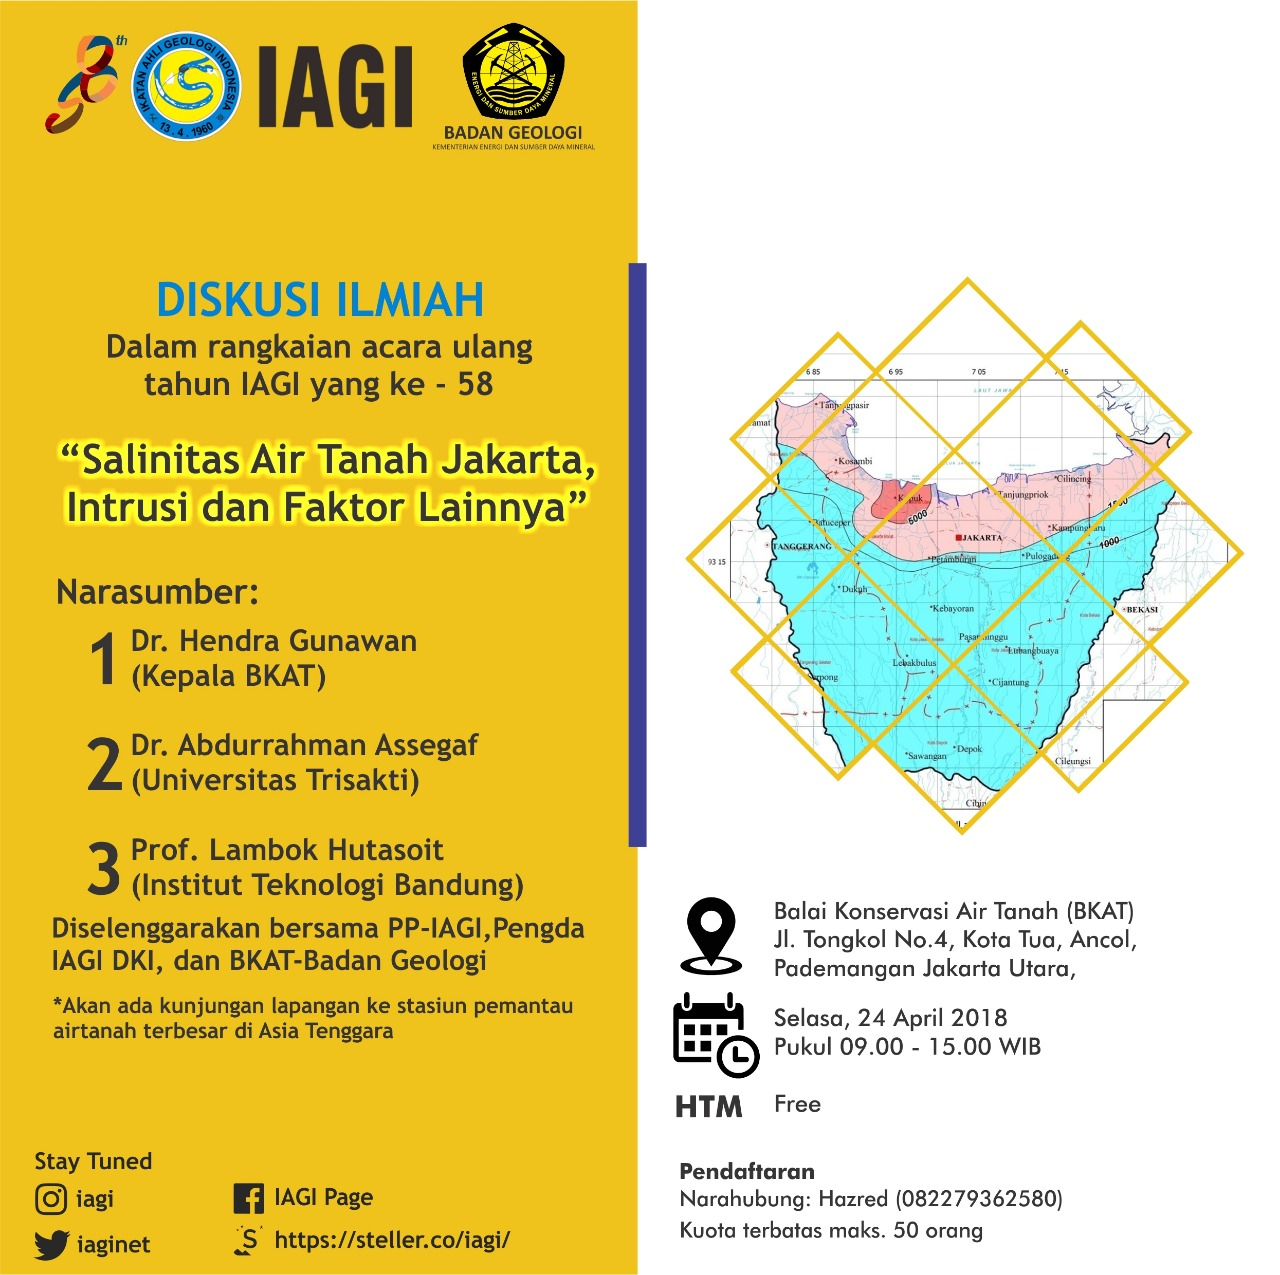 Diskusi Ilmiah salinitas air tanah Jakarta